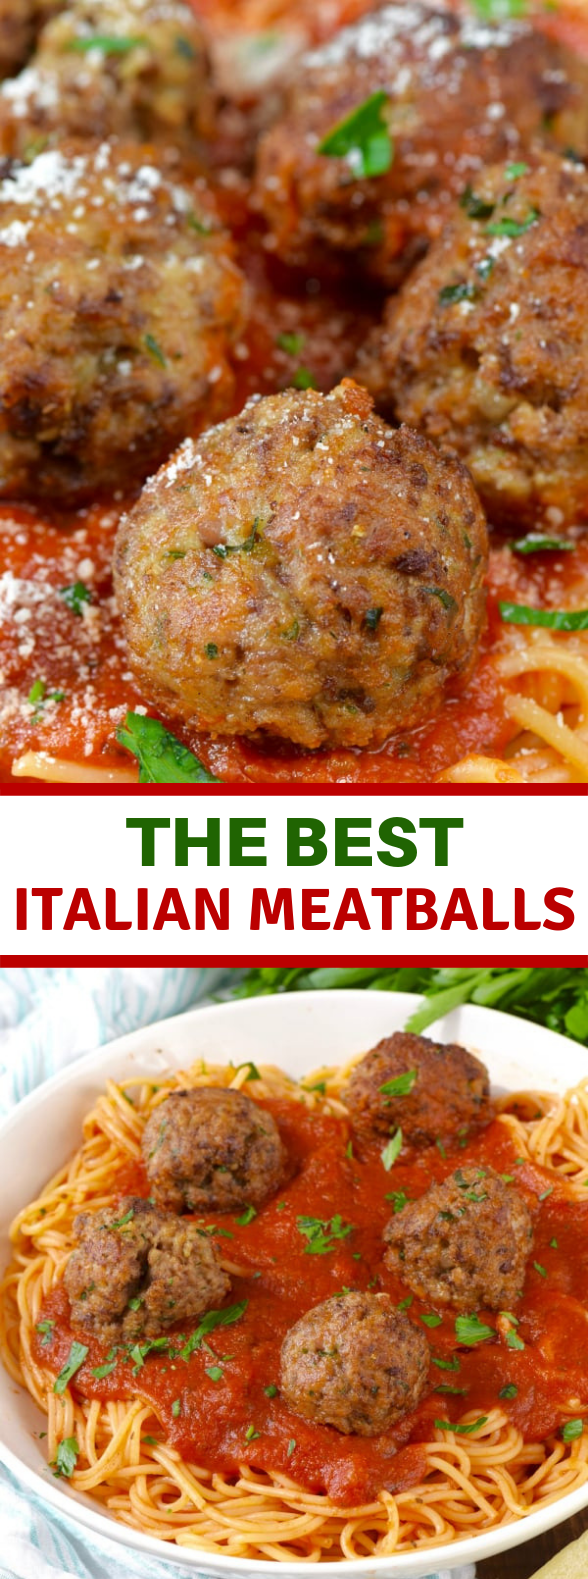 The BEST Italian Meatballs #Dinner #GrandmotherRecipe